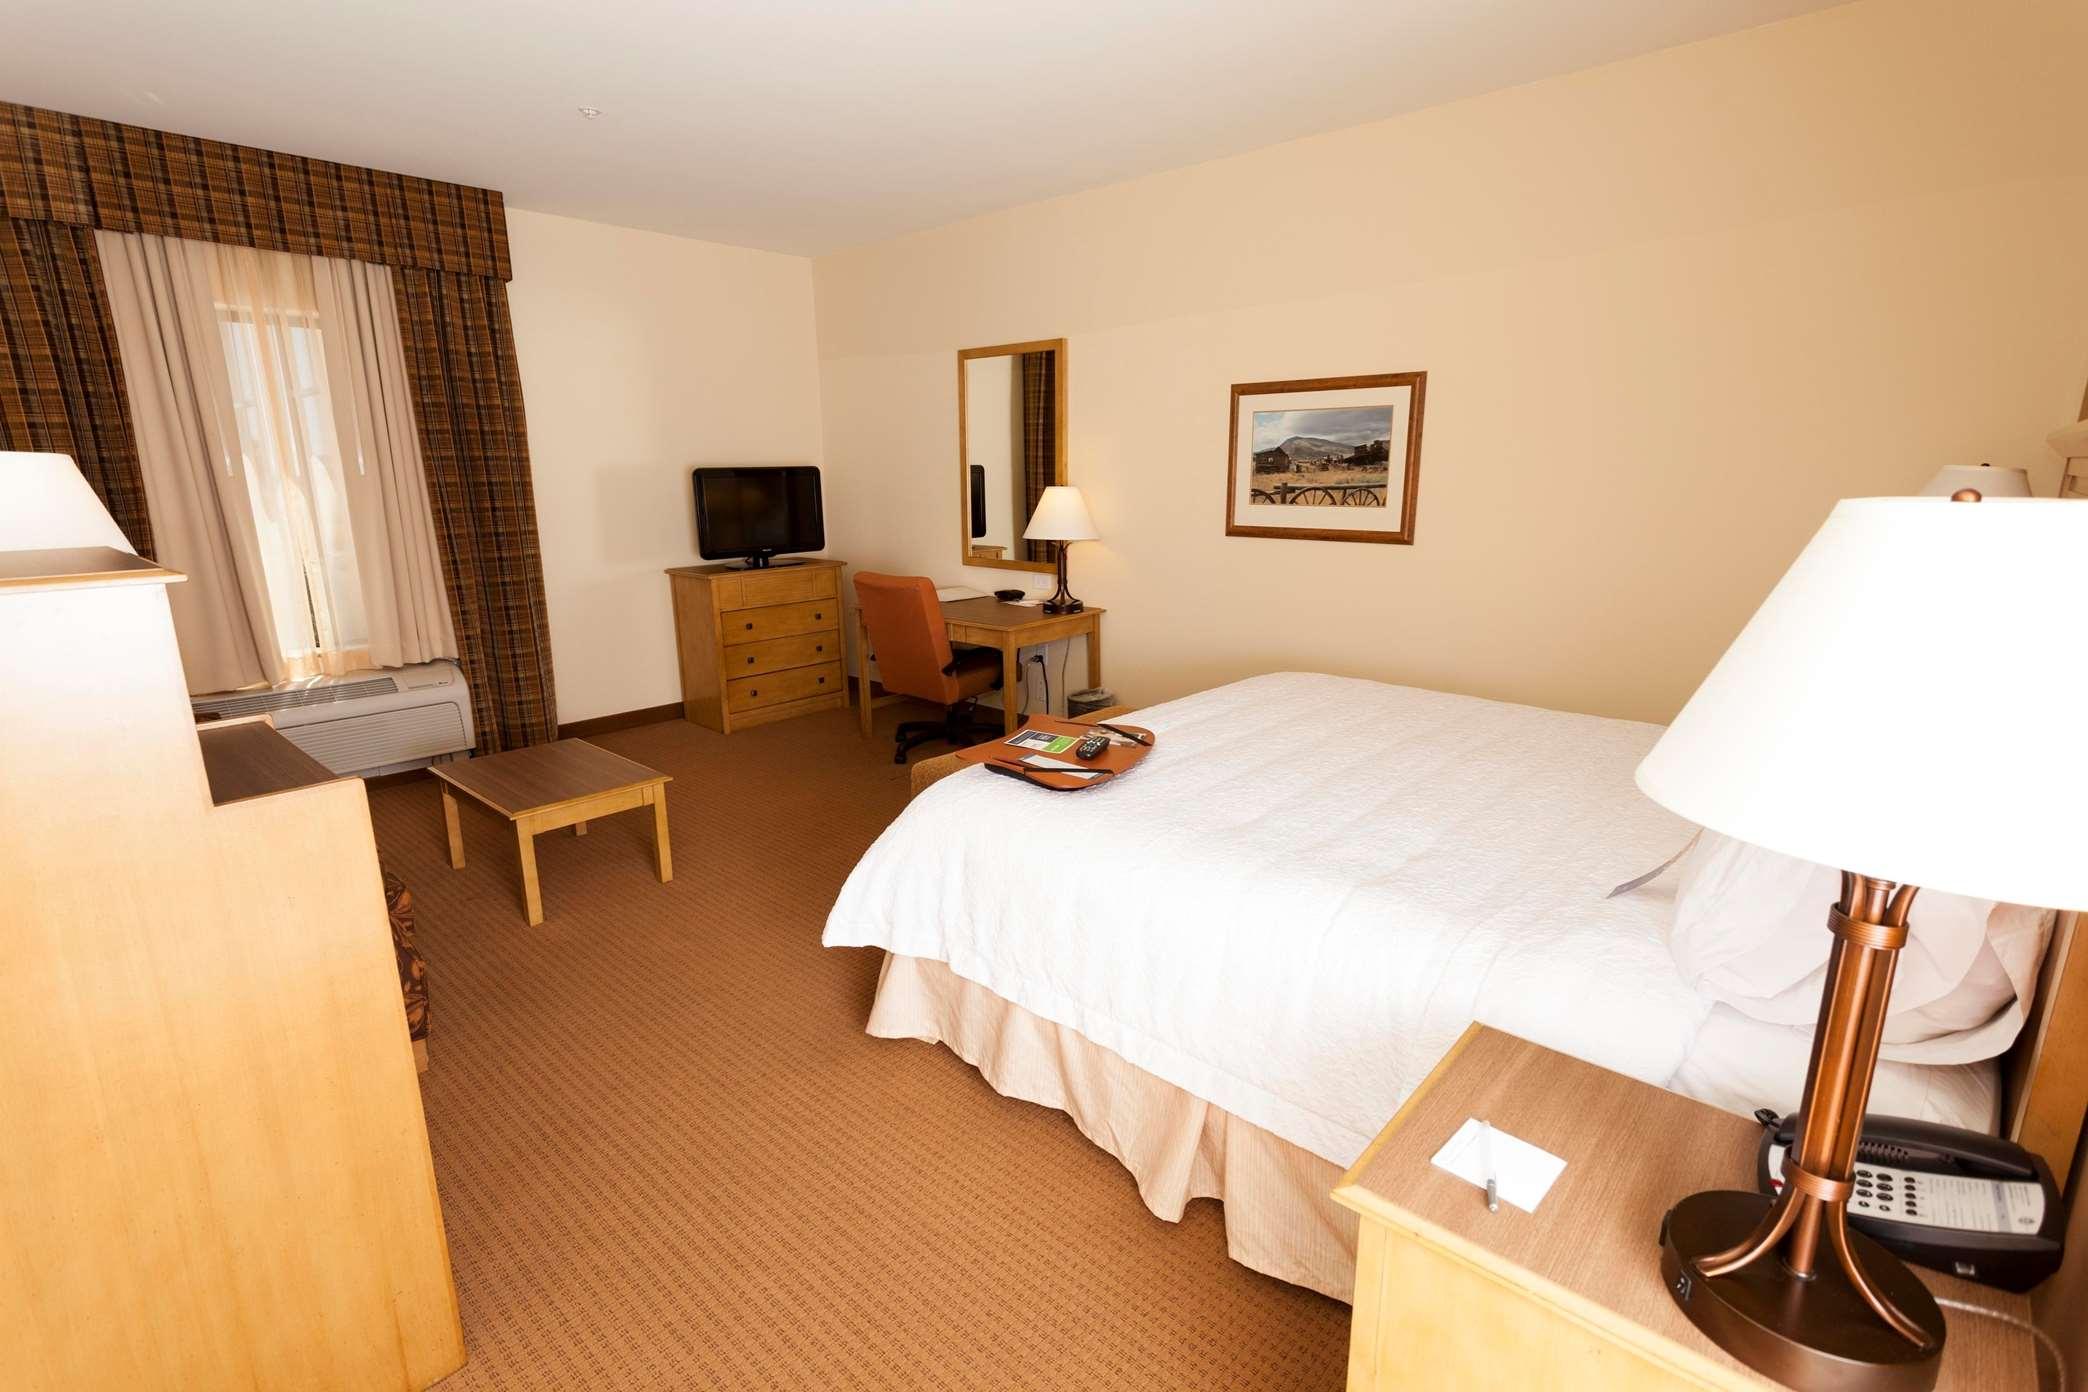 Hampton Inn & Suites Riverton image 37